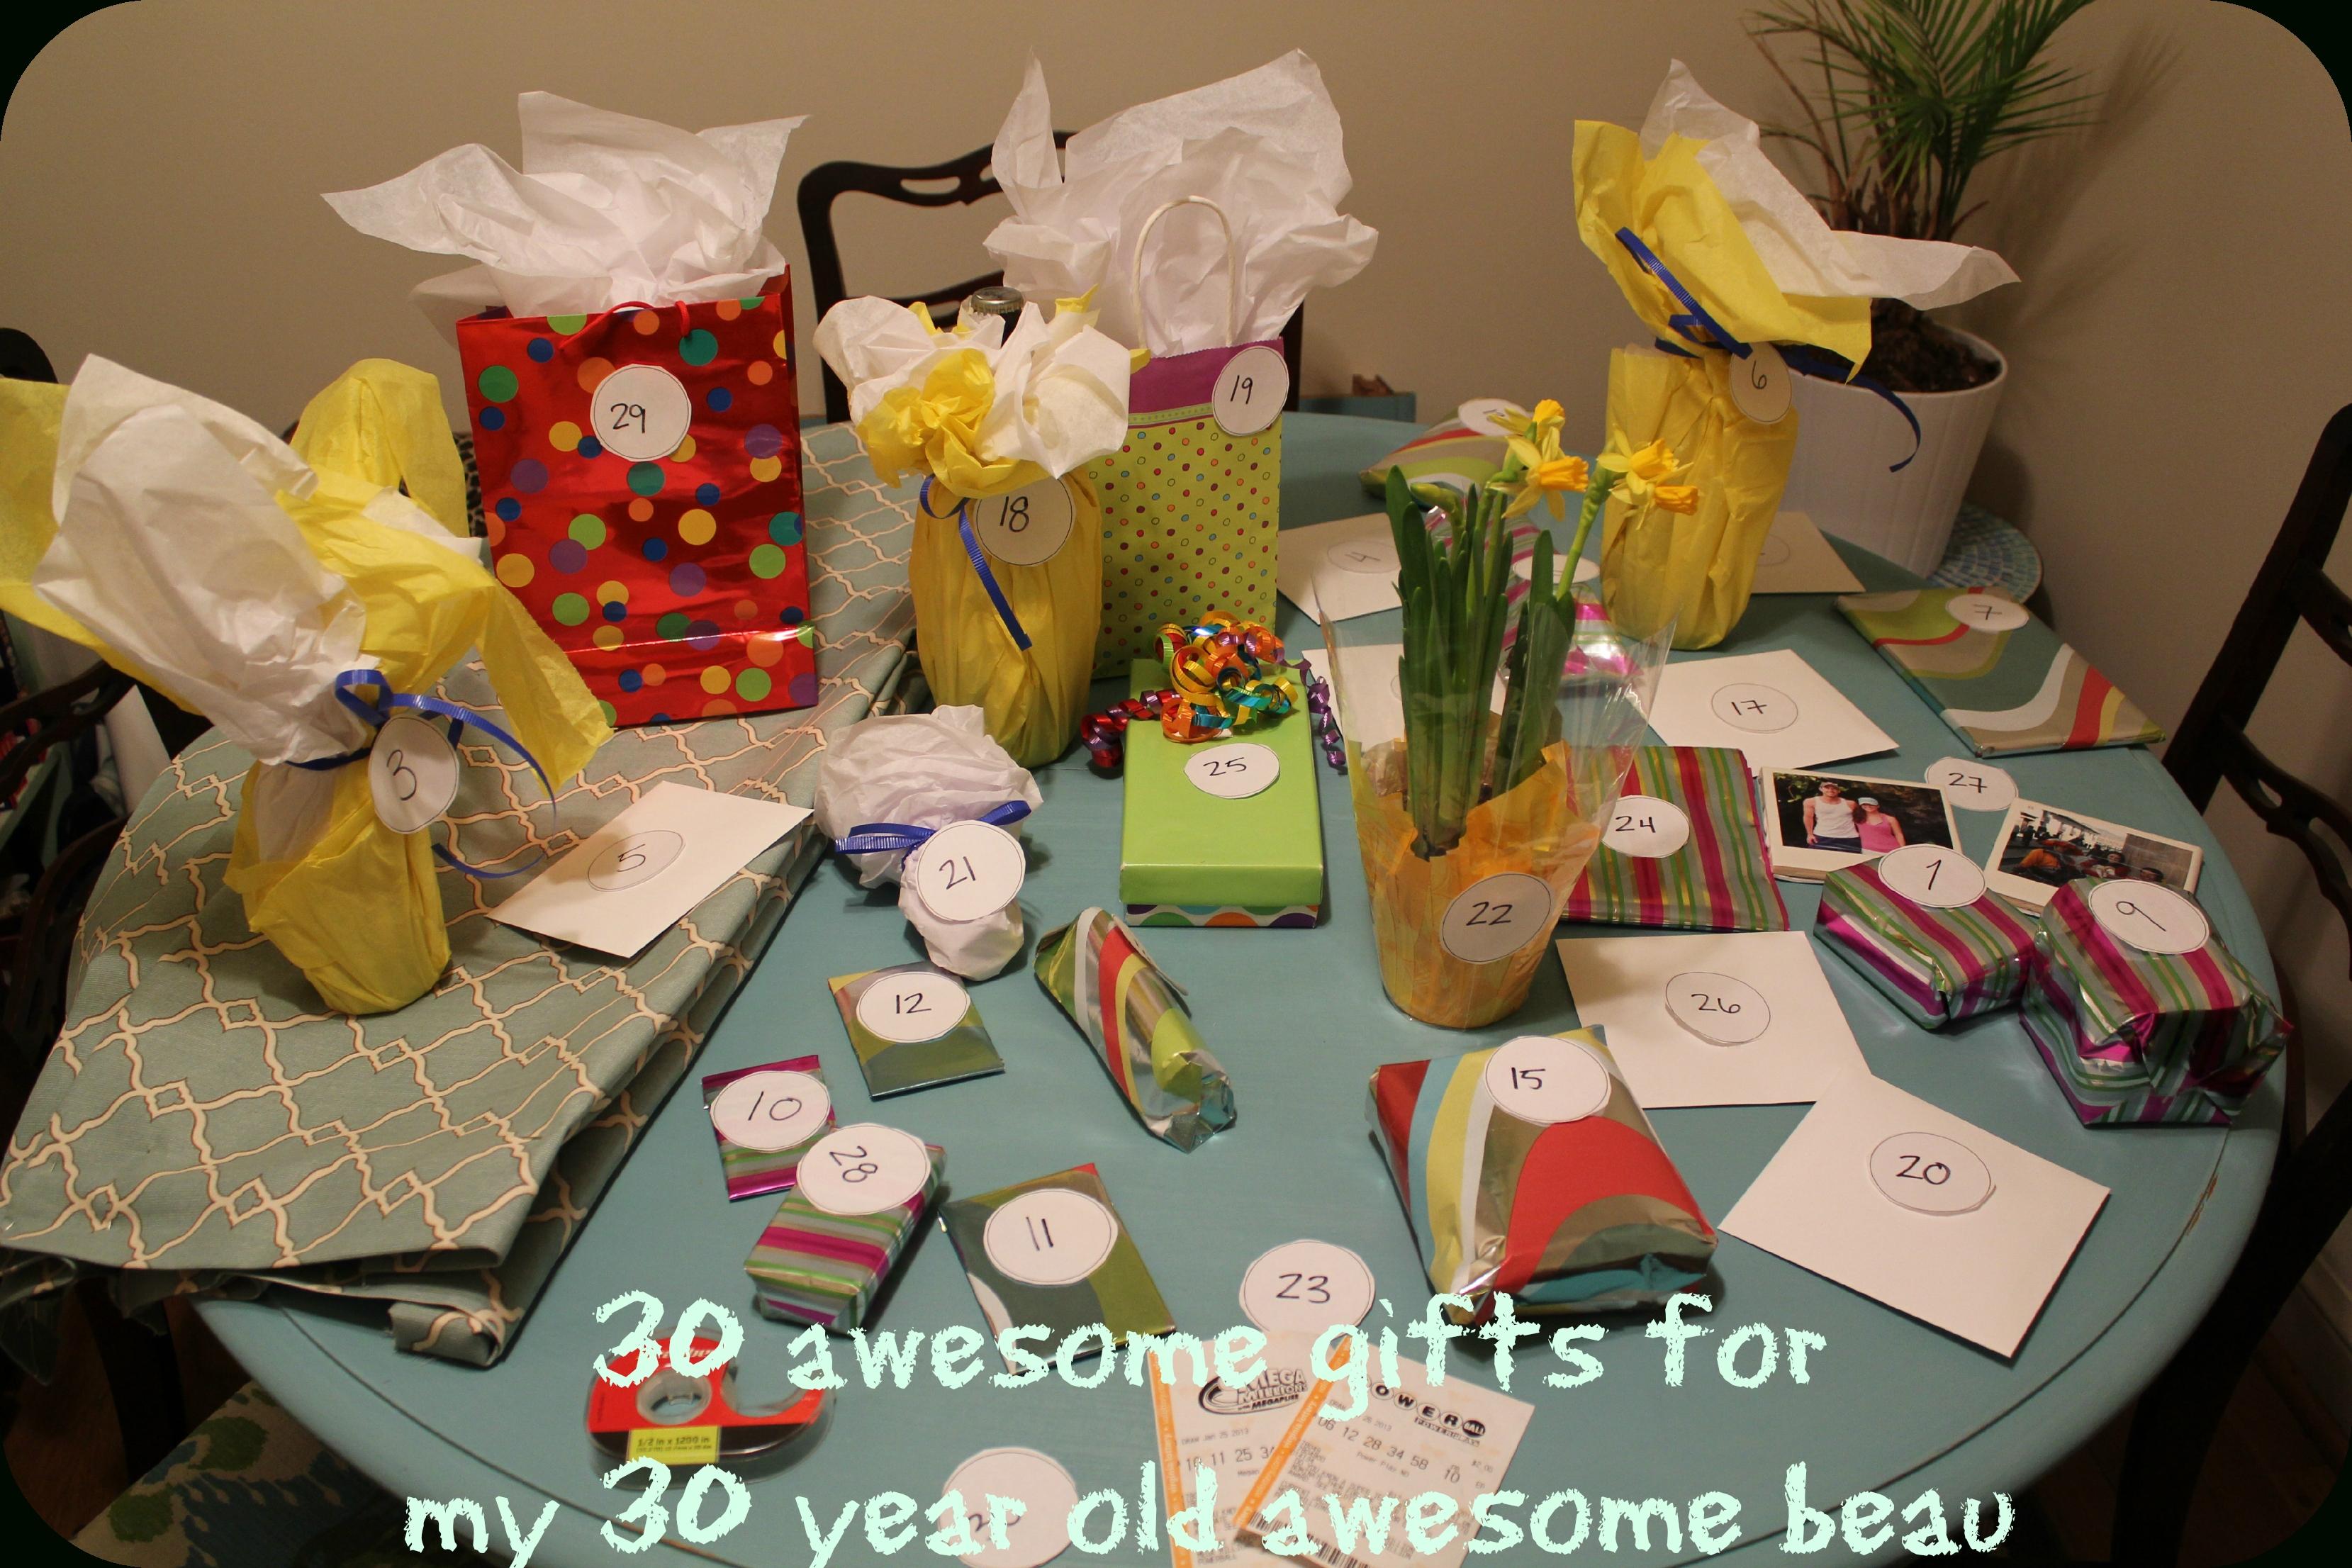 30 birthday gifts for 30th birthday | gypsy soul